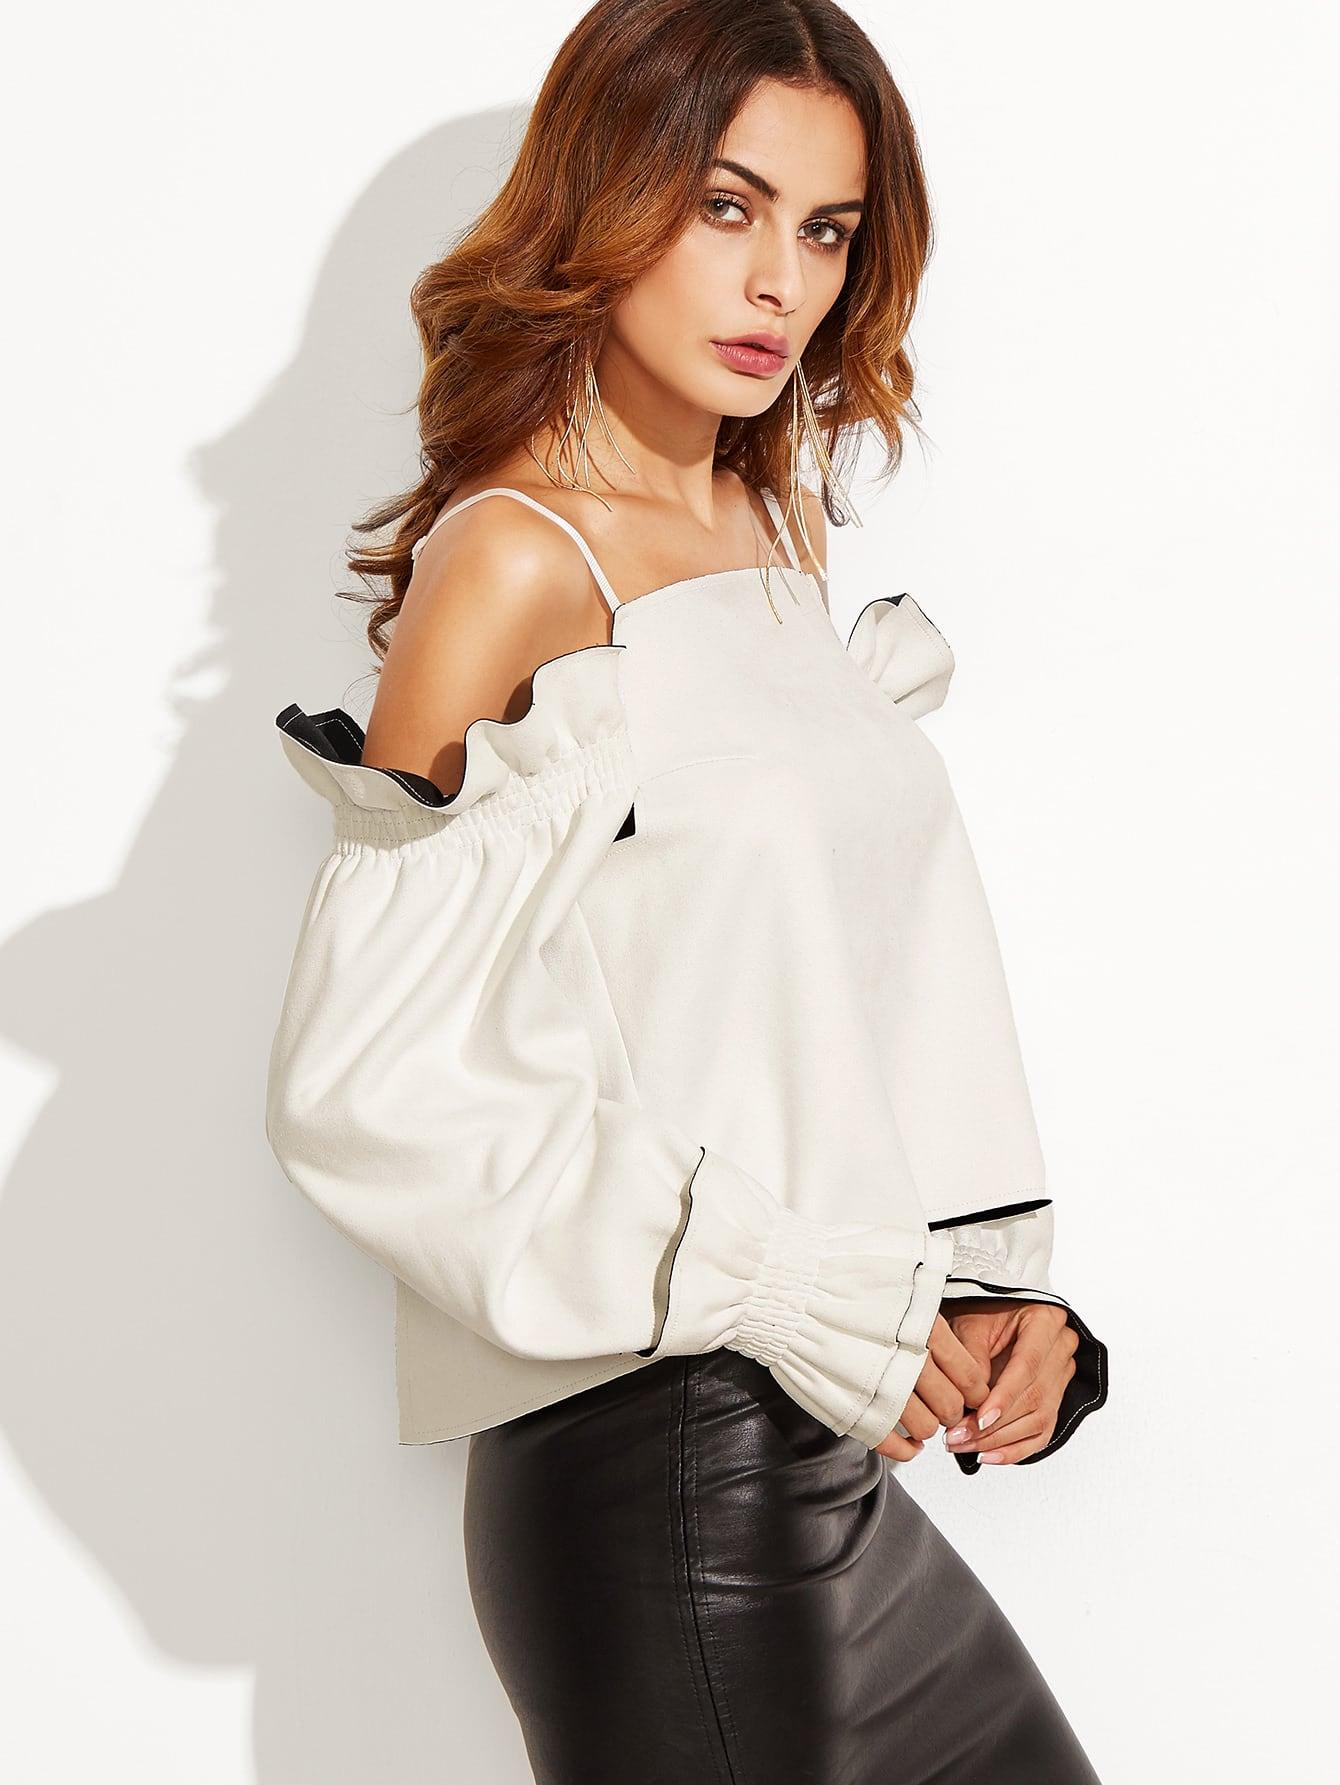 blouse160819702_4